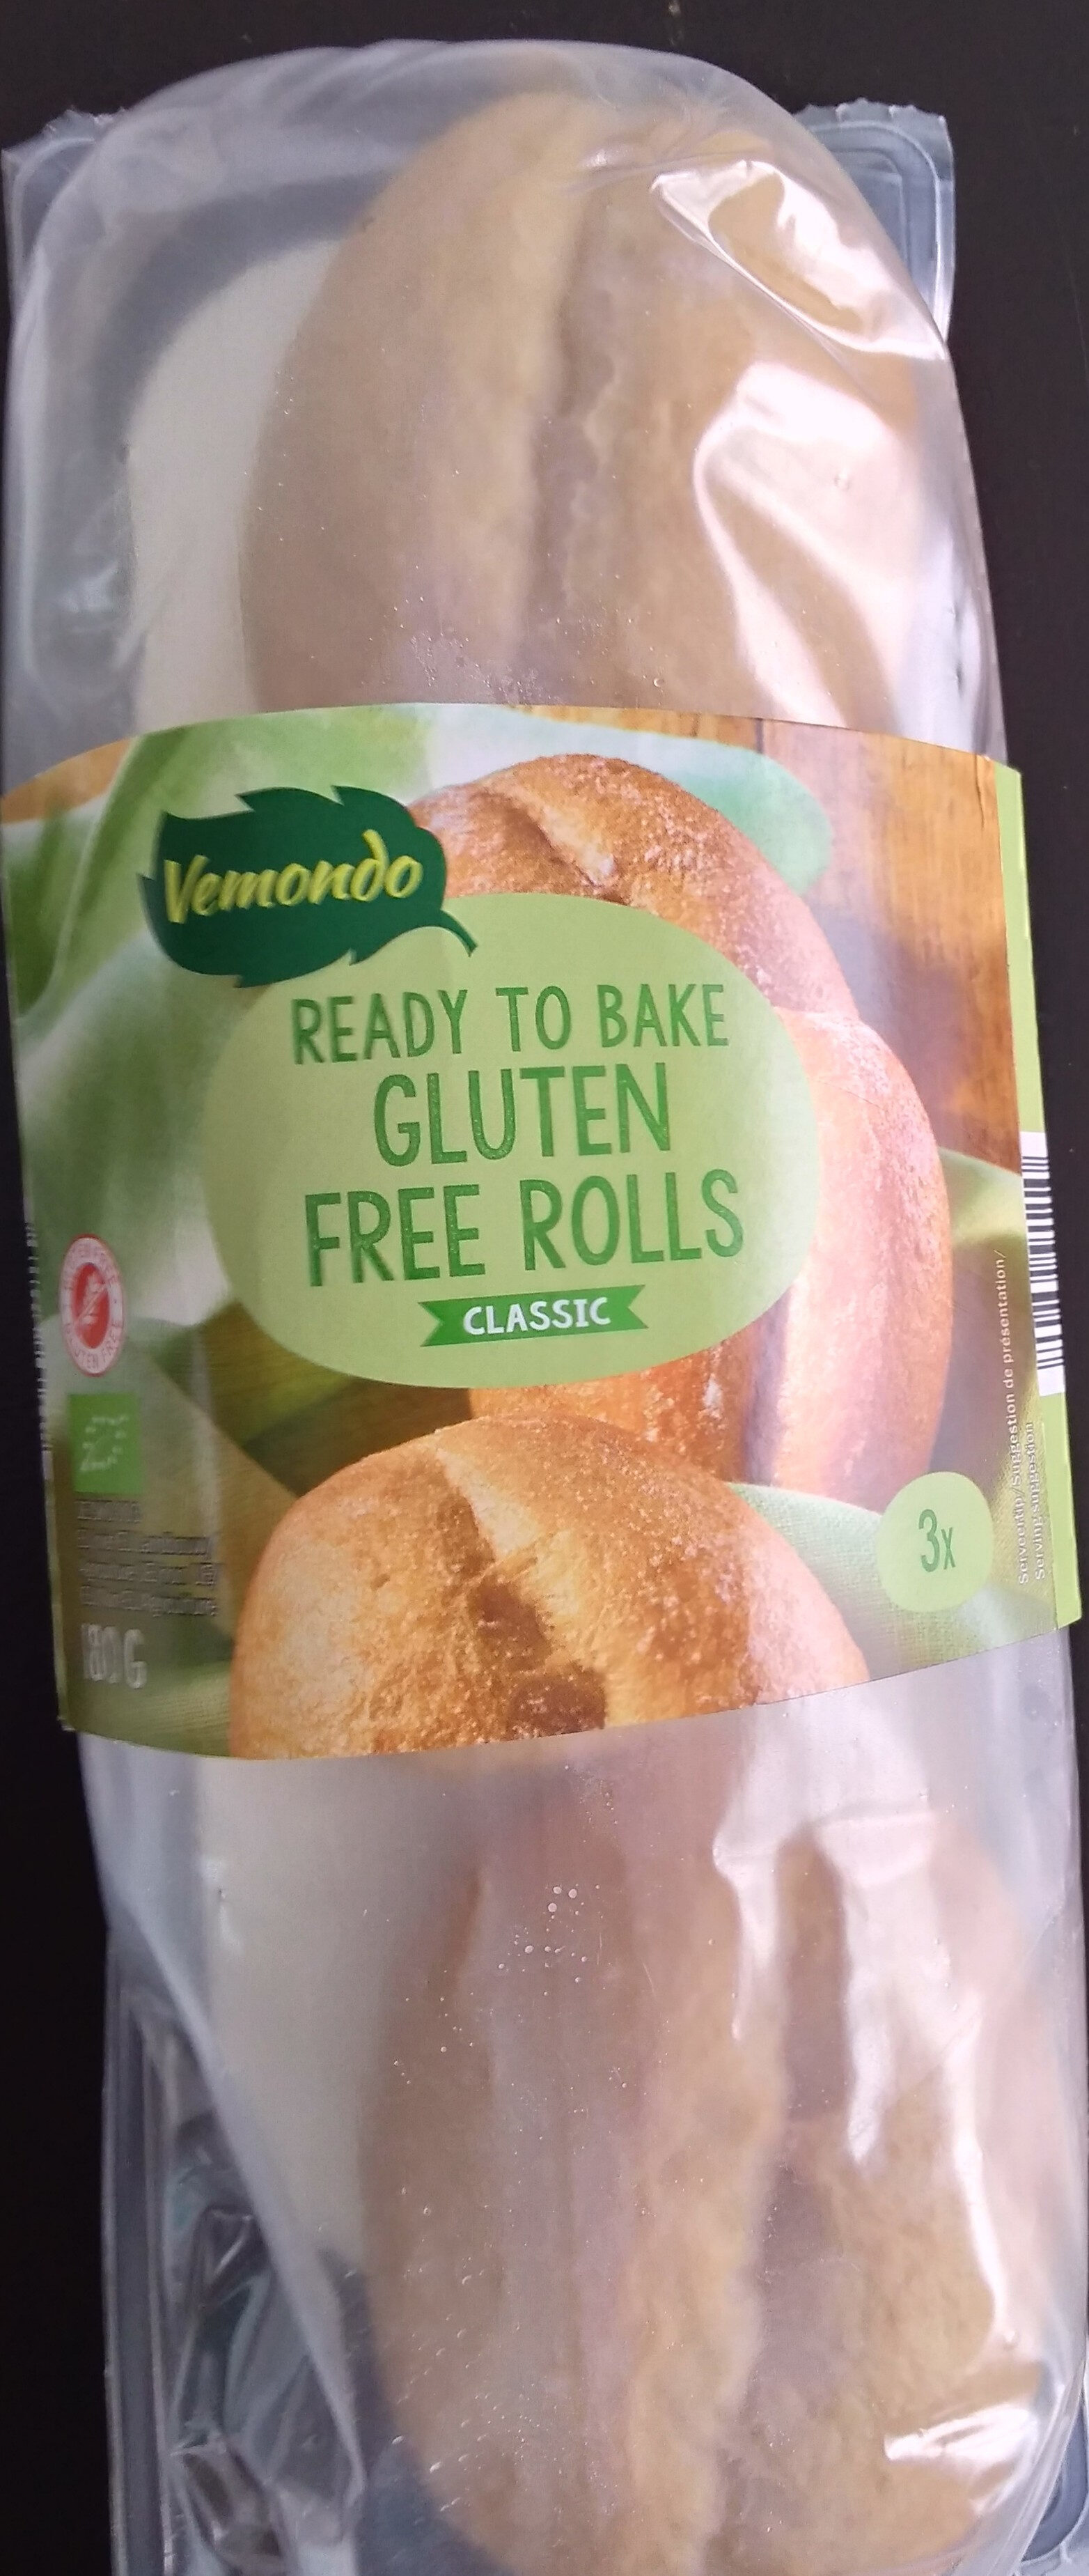 Glutenfree rolls classic - Product - fr